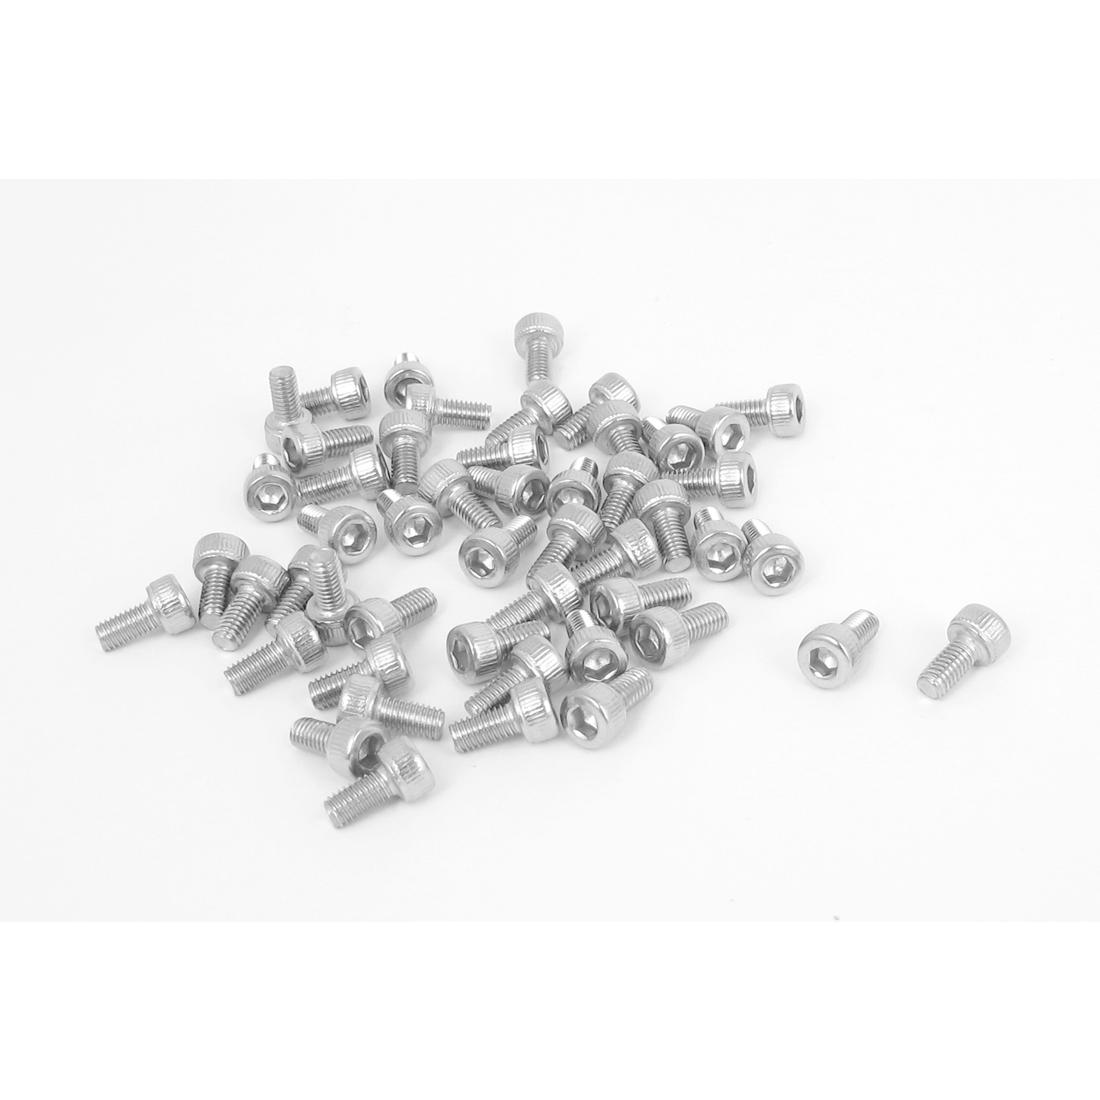 M3x6mm Thread 304 Stainless Steel Hex Key Bolt Socket Head Cap Screws 50pcs